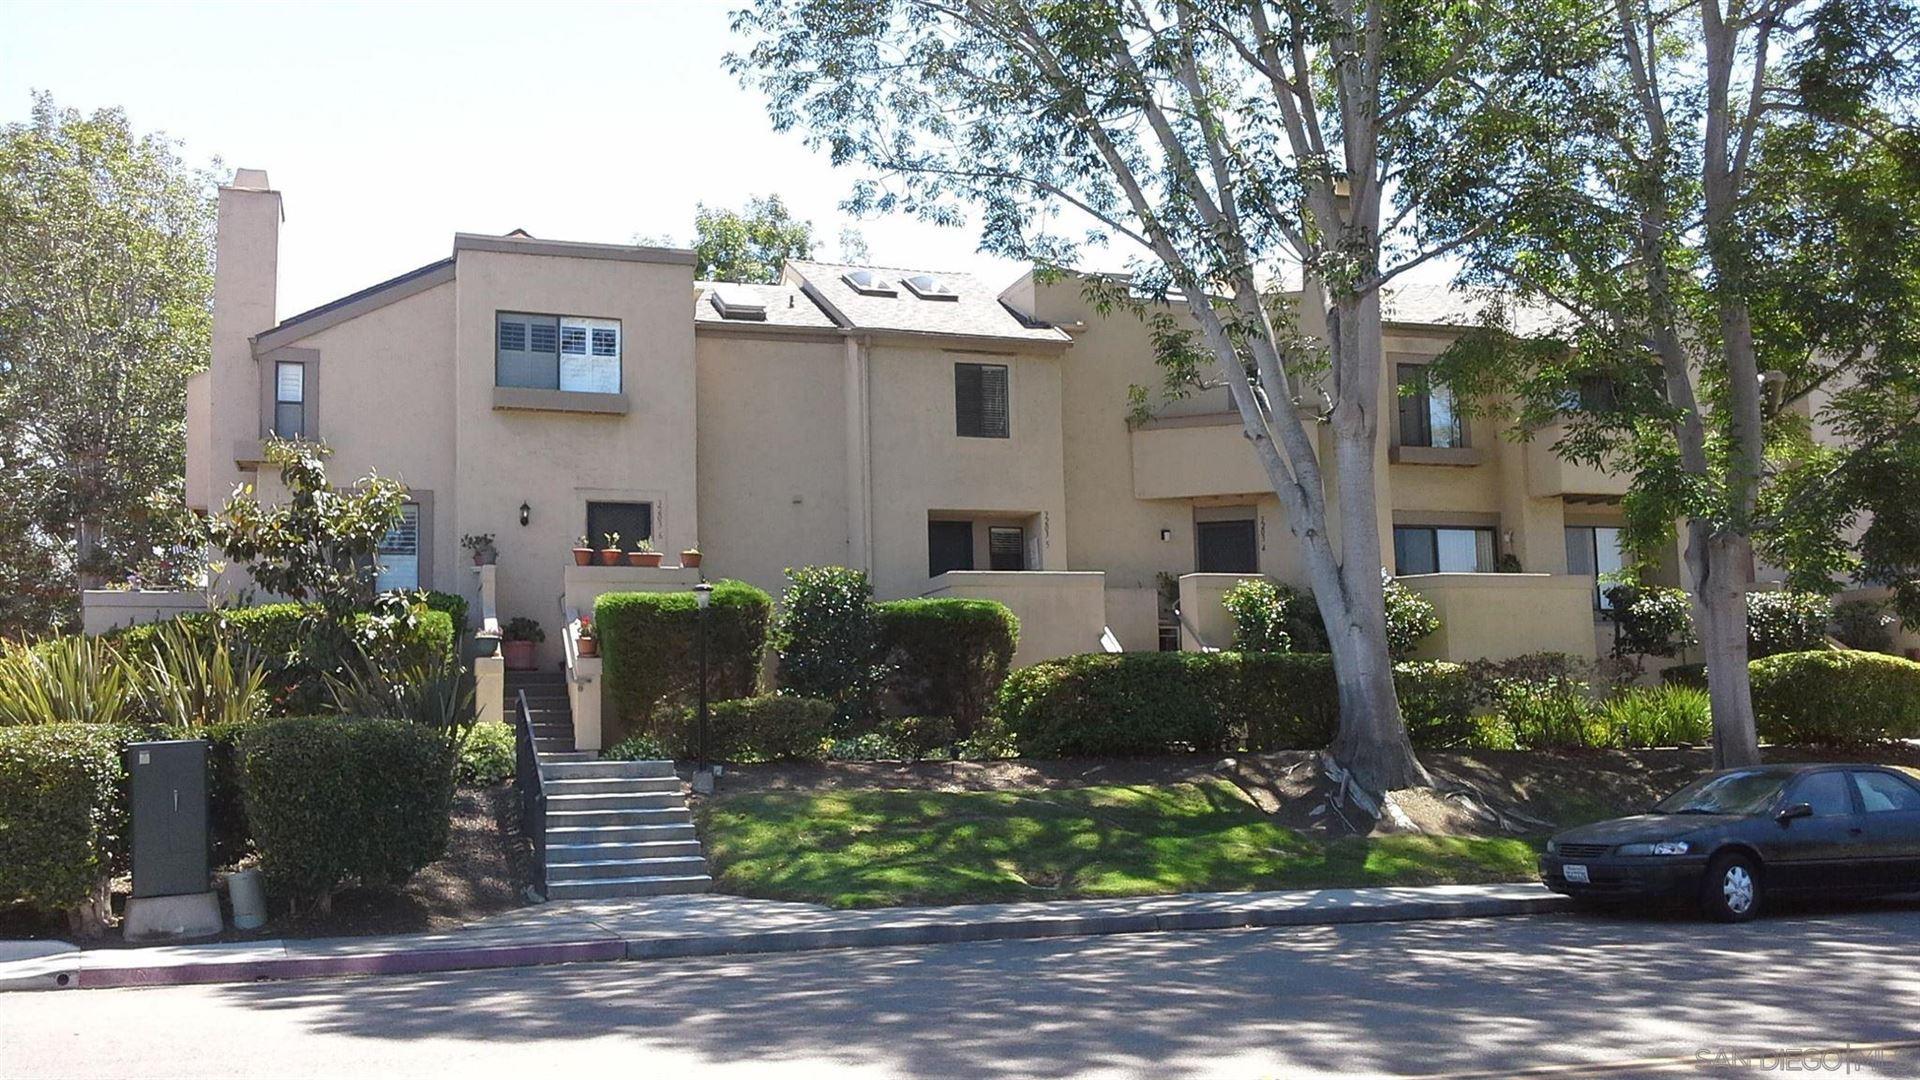 Photo of 3203 Via Alicante #5, La Jolla, CA 92037 (MLS # 210015908)